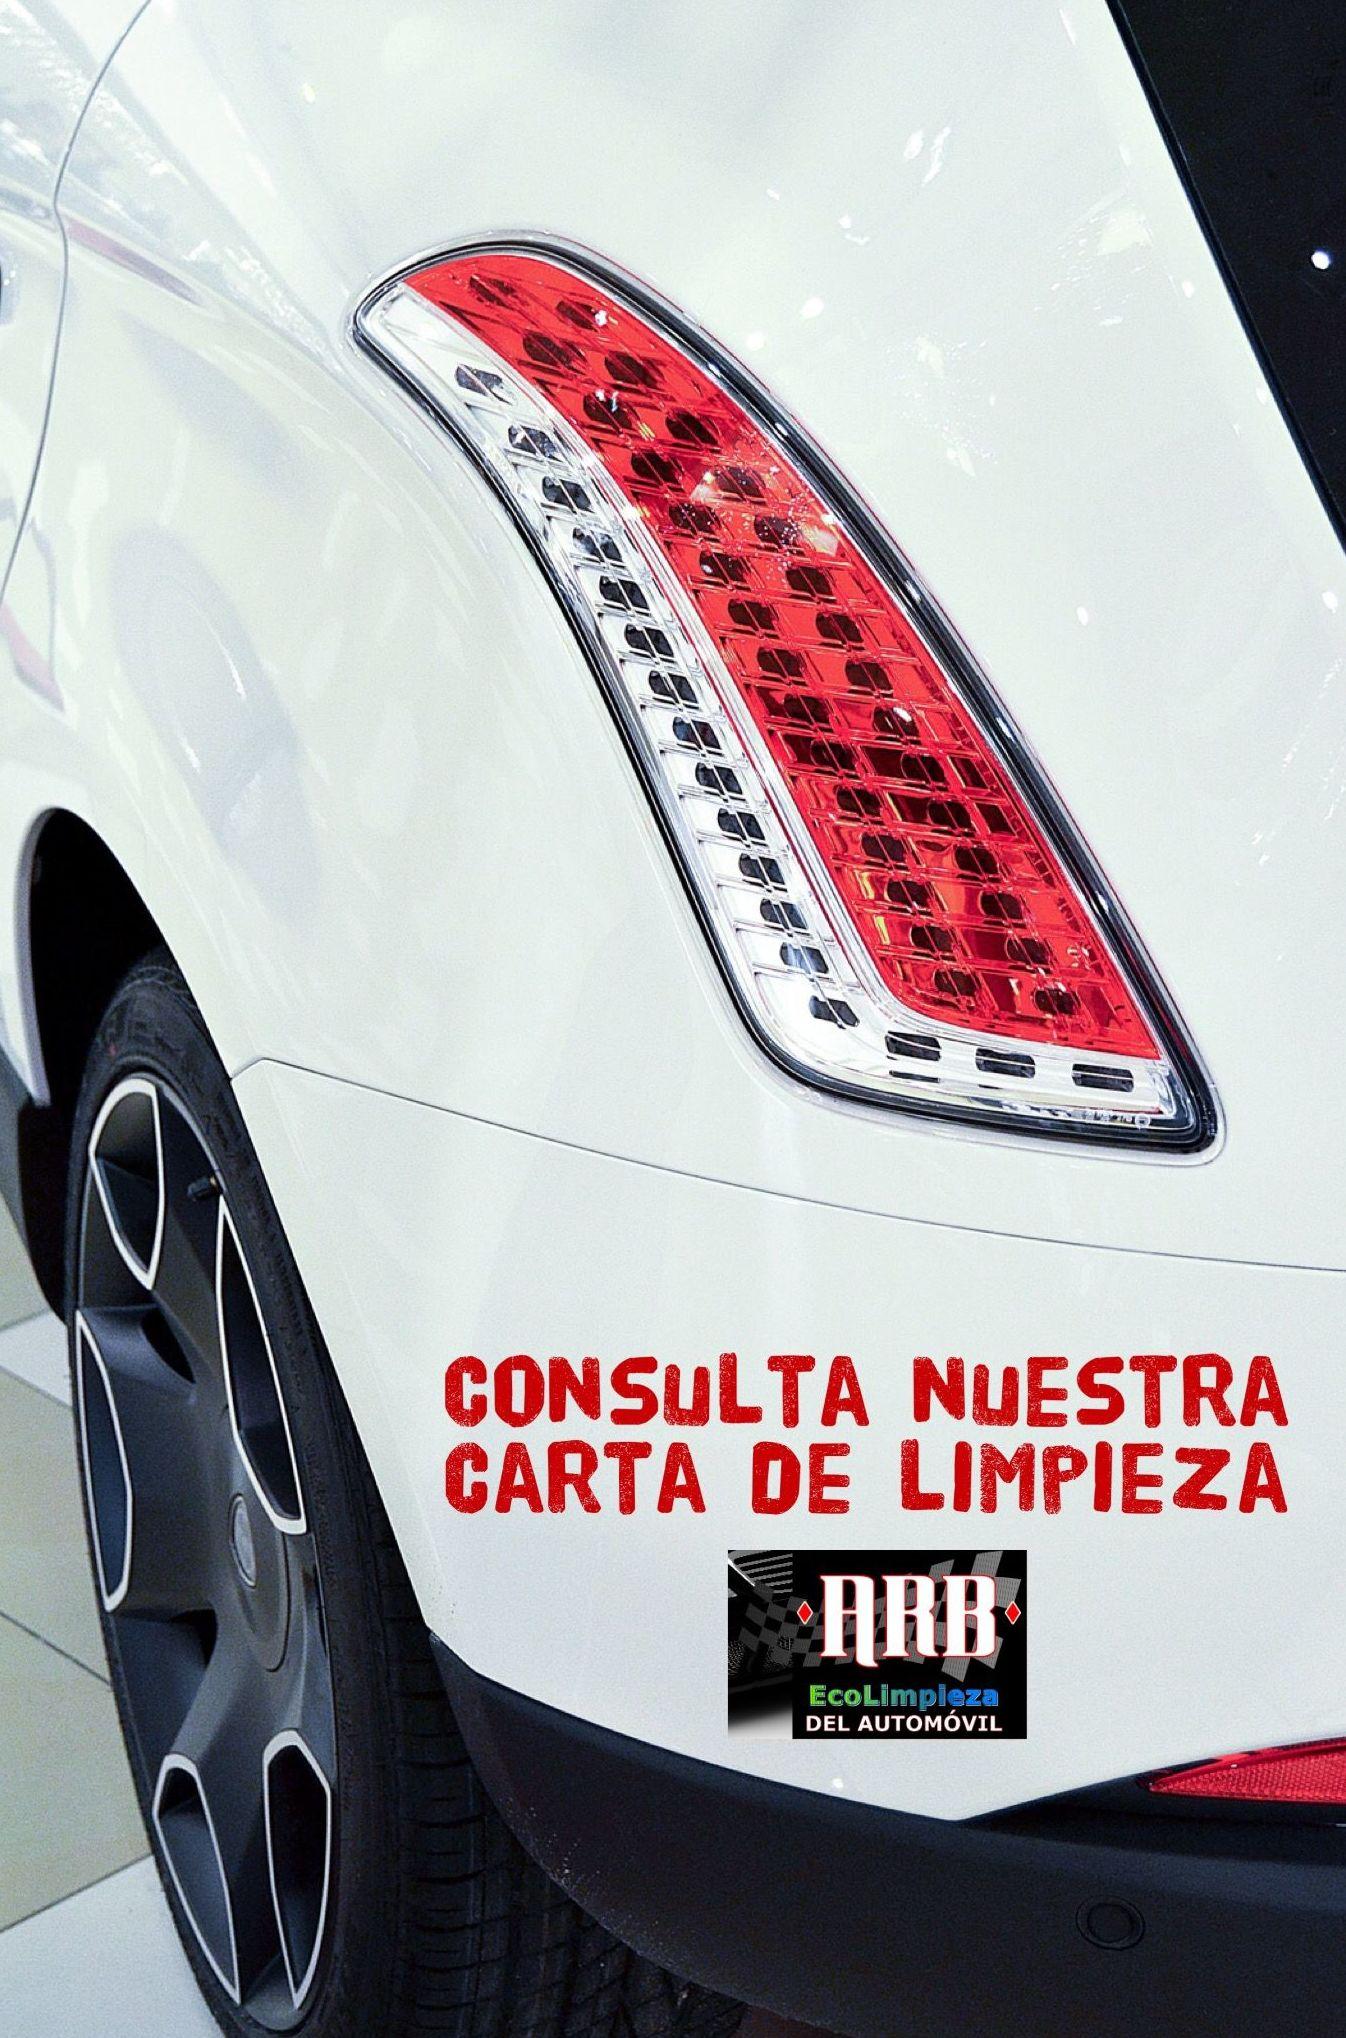 Foto 1 de Talleres de automóviles en Aranjuez | Talleres Multimarca ARB Express